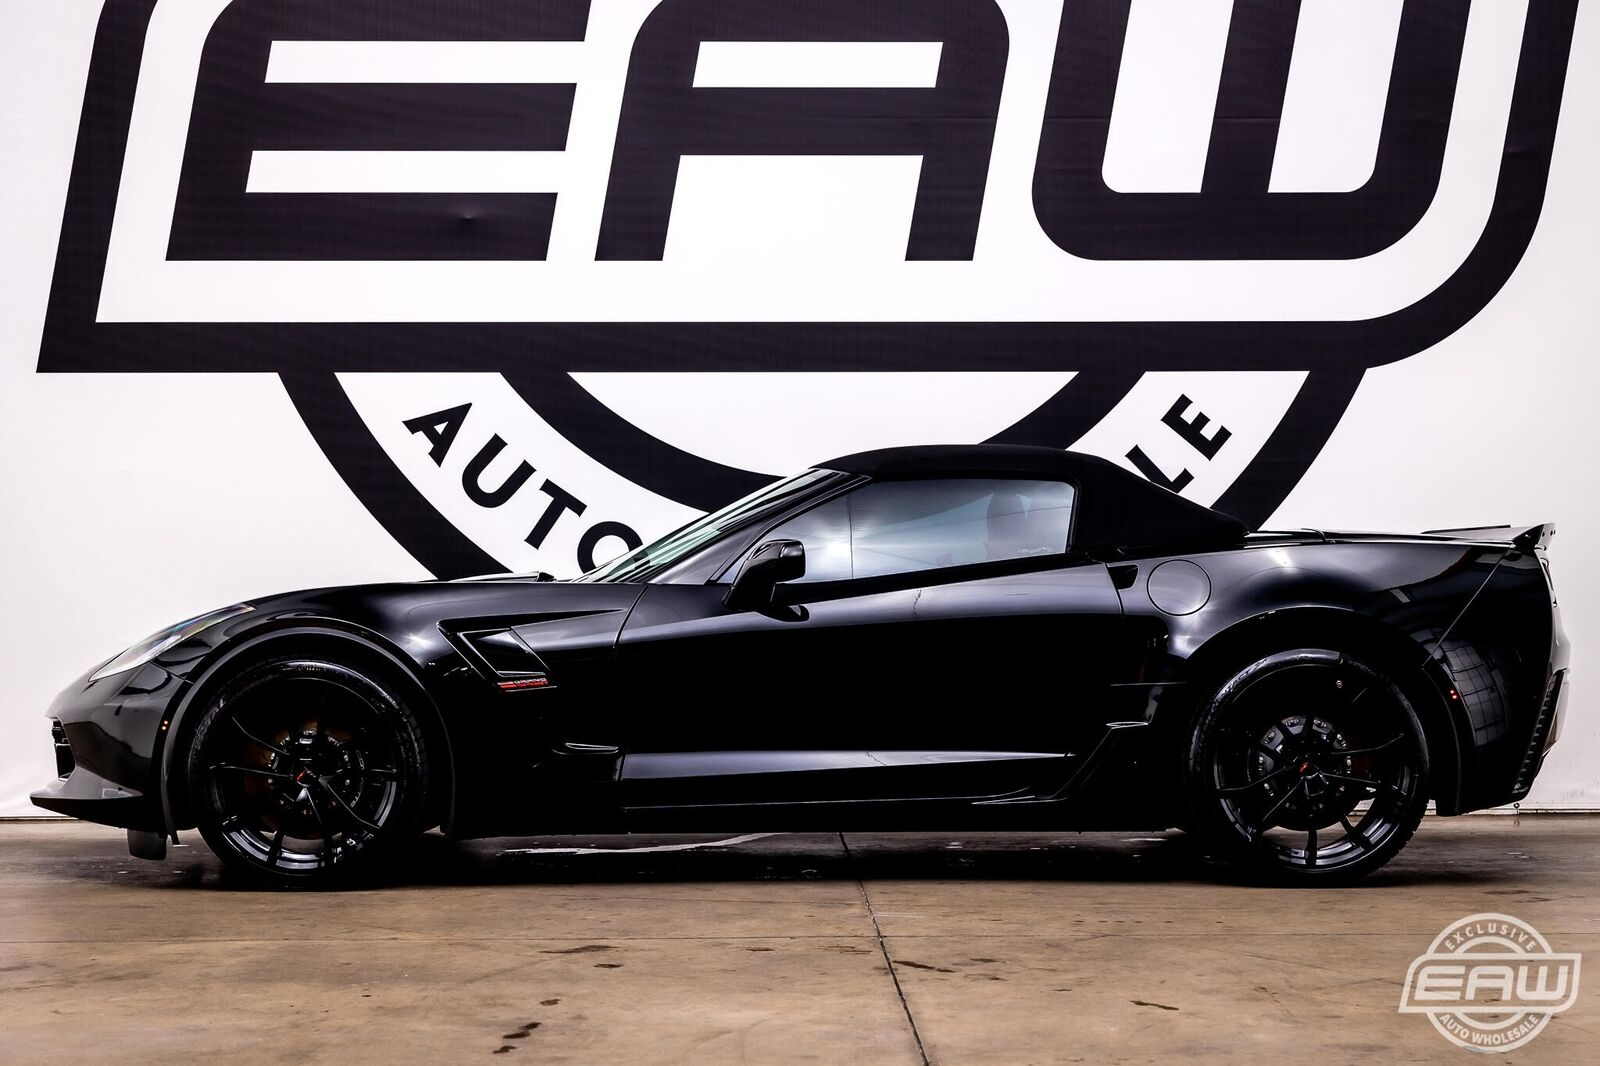 2019 Black Chevrolet Corvette Convertible 2LT | C7 Corvette Photo 7